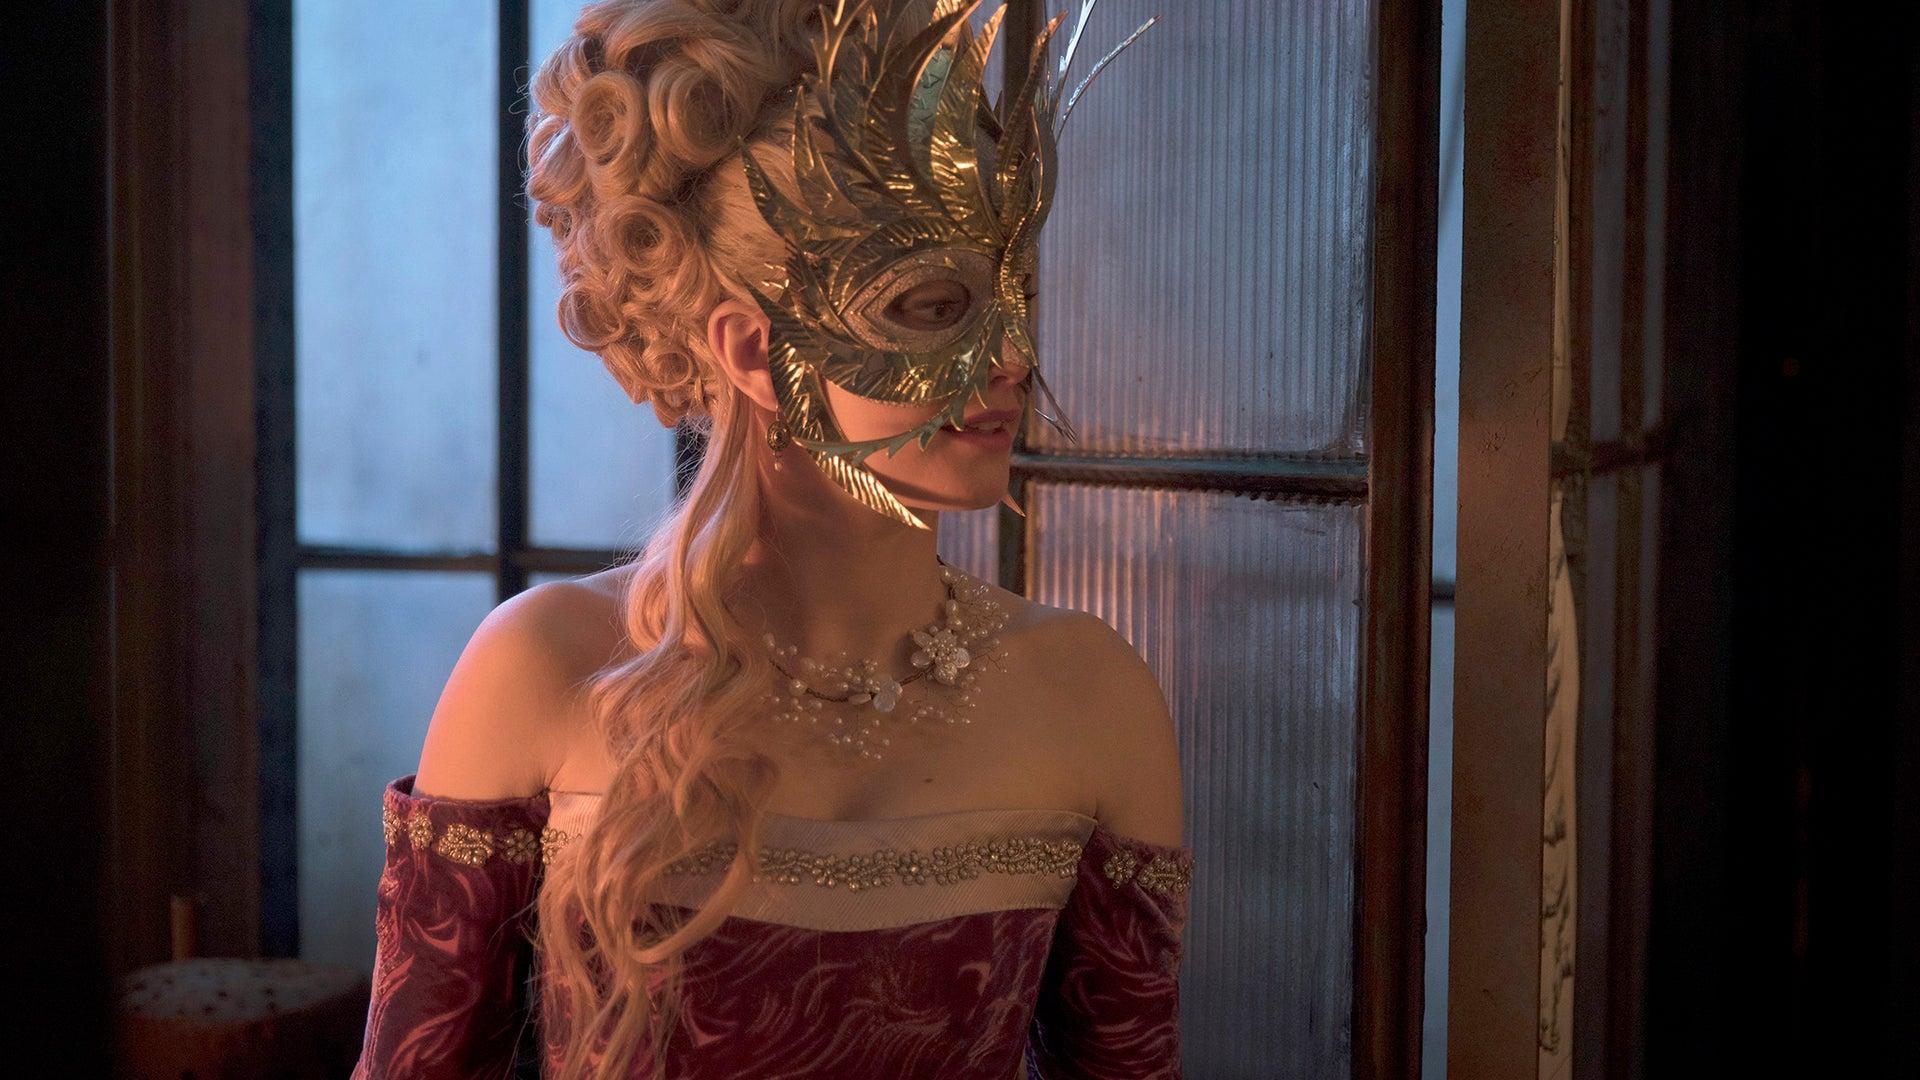 : Stefanie Martini as Lady Ev